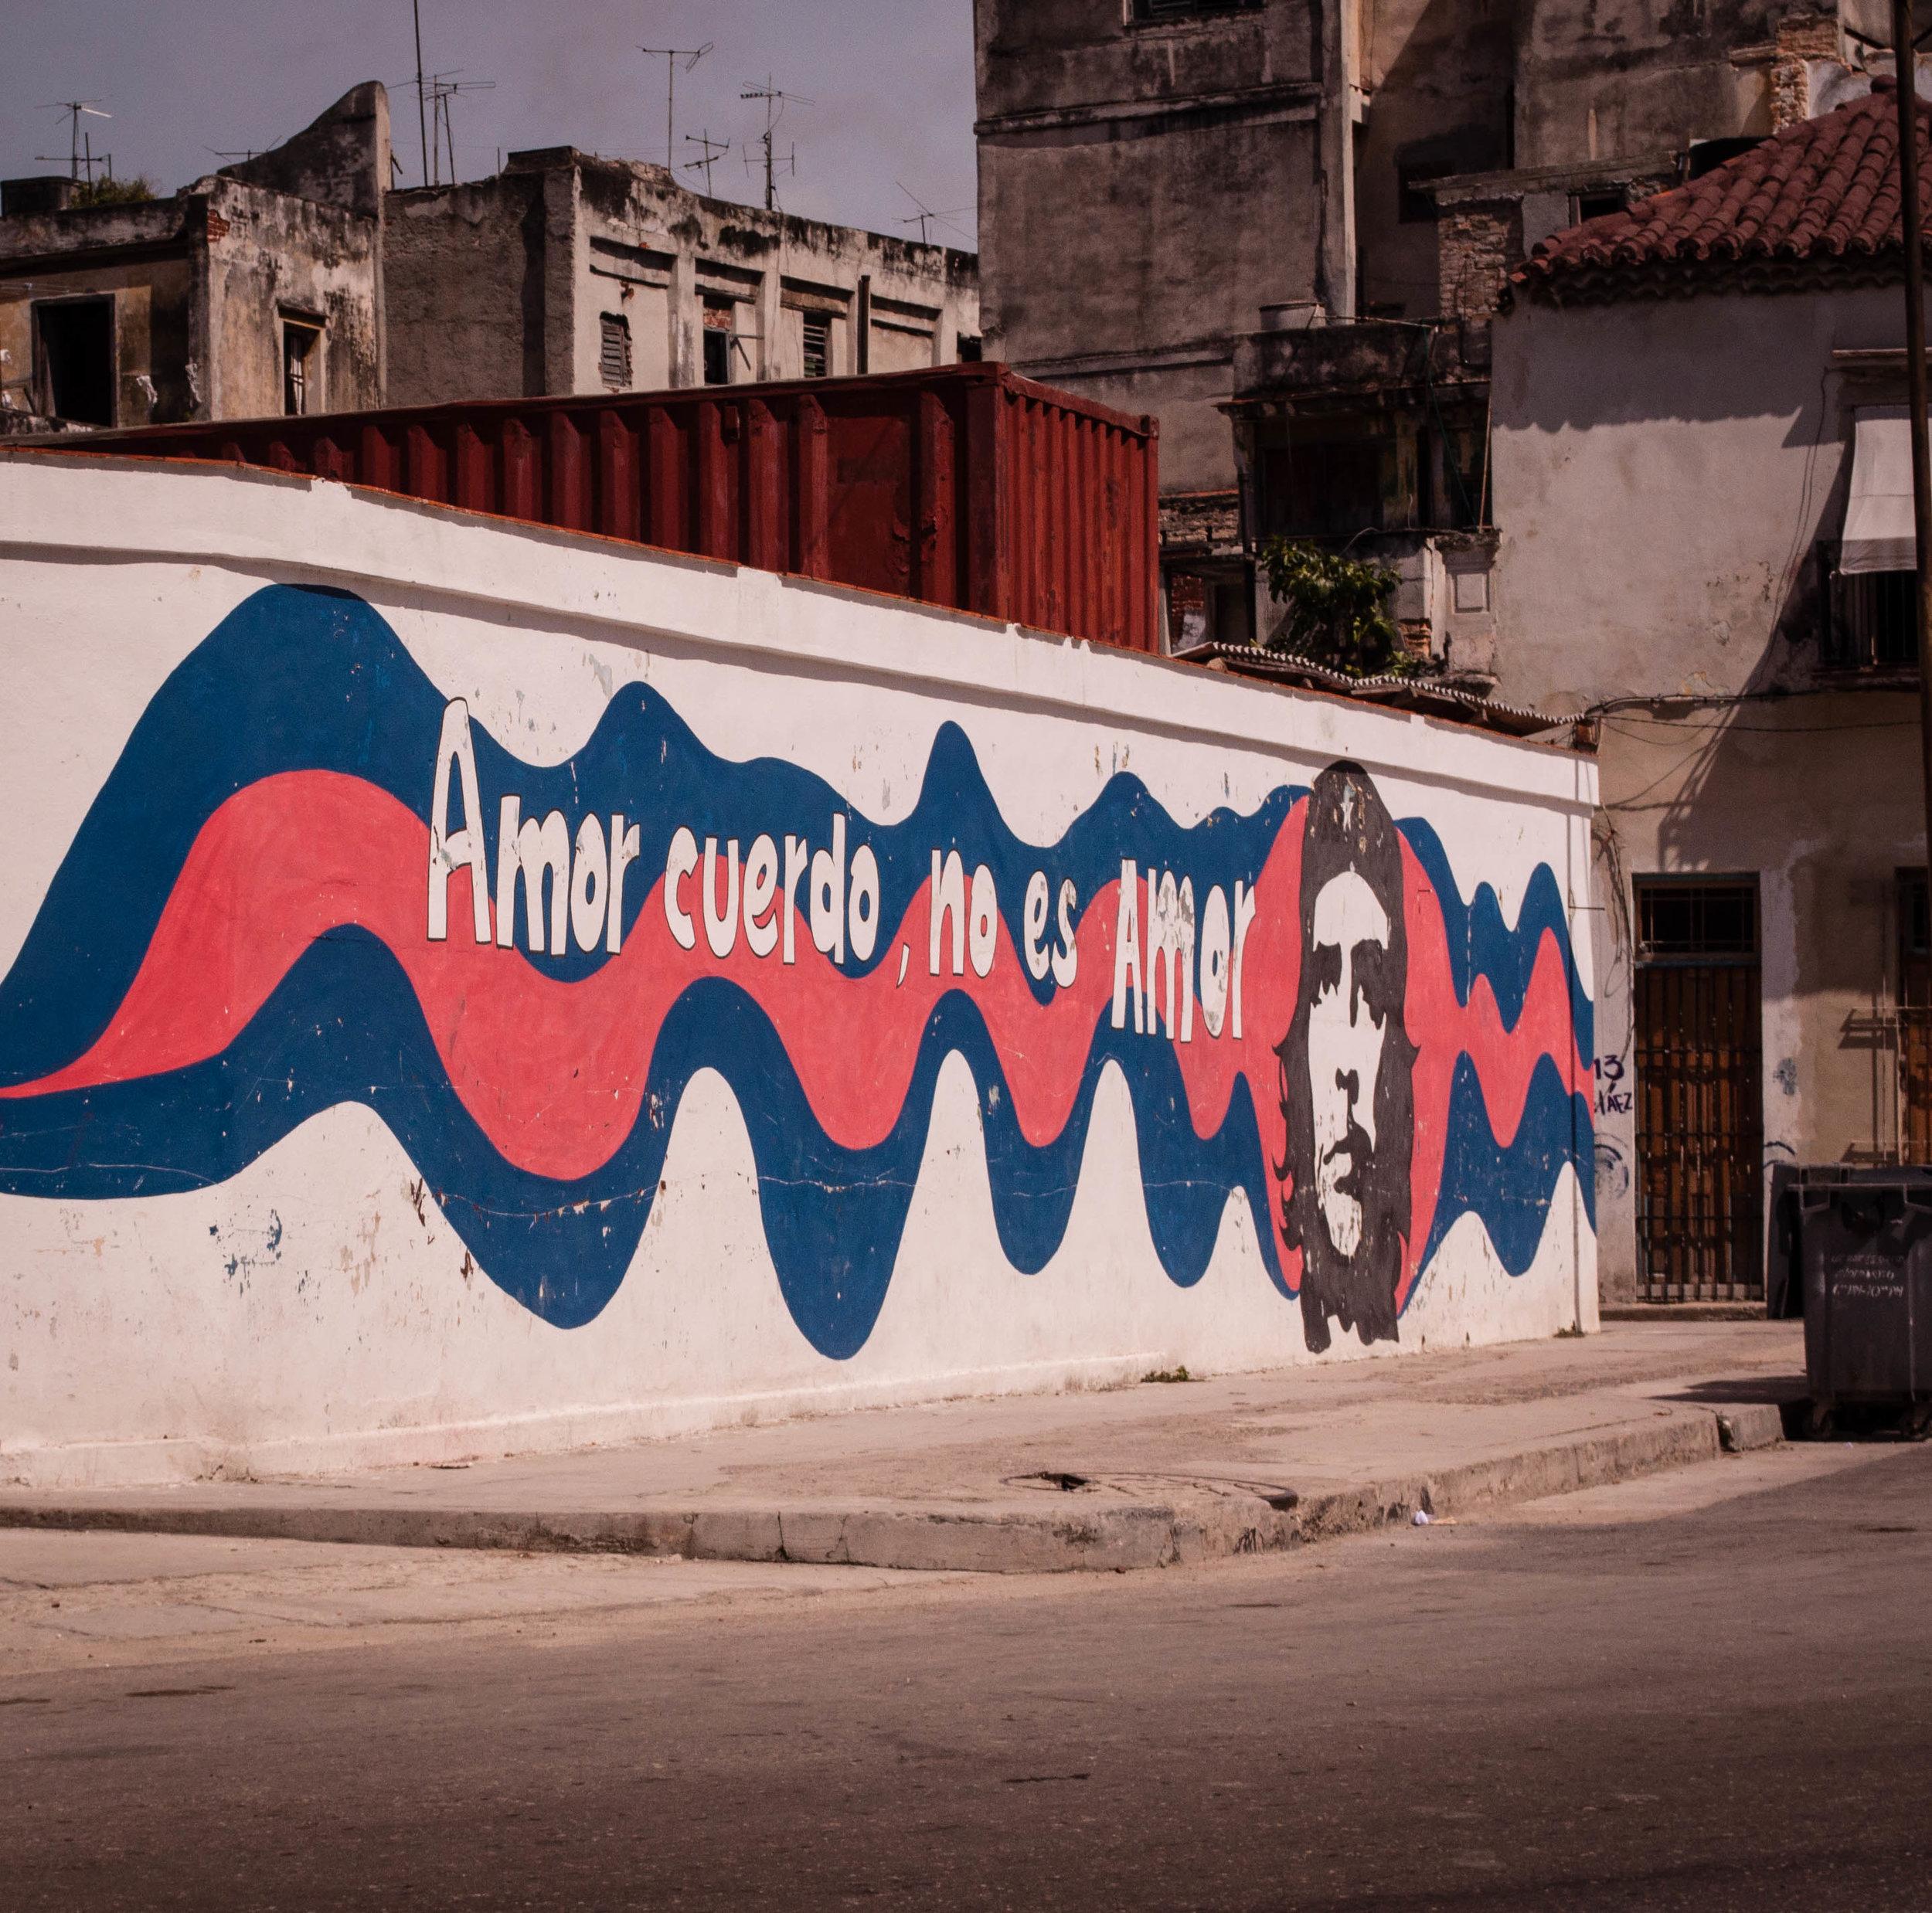 Slogan of Che Guevara with his portrait on a wall in La Havana